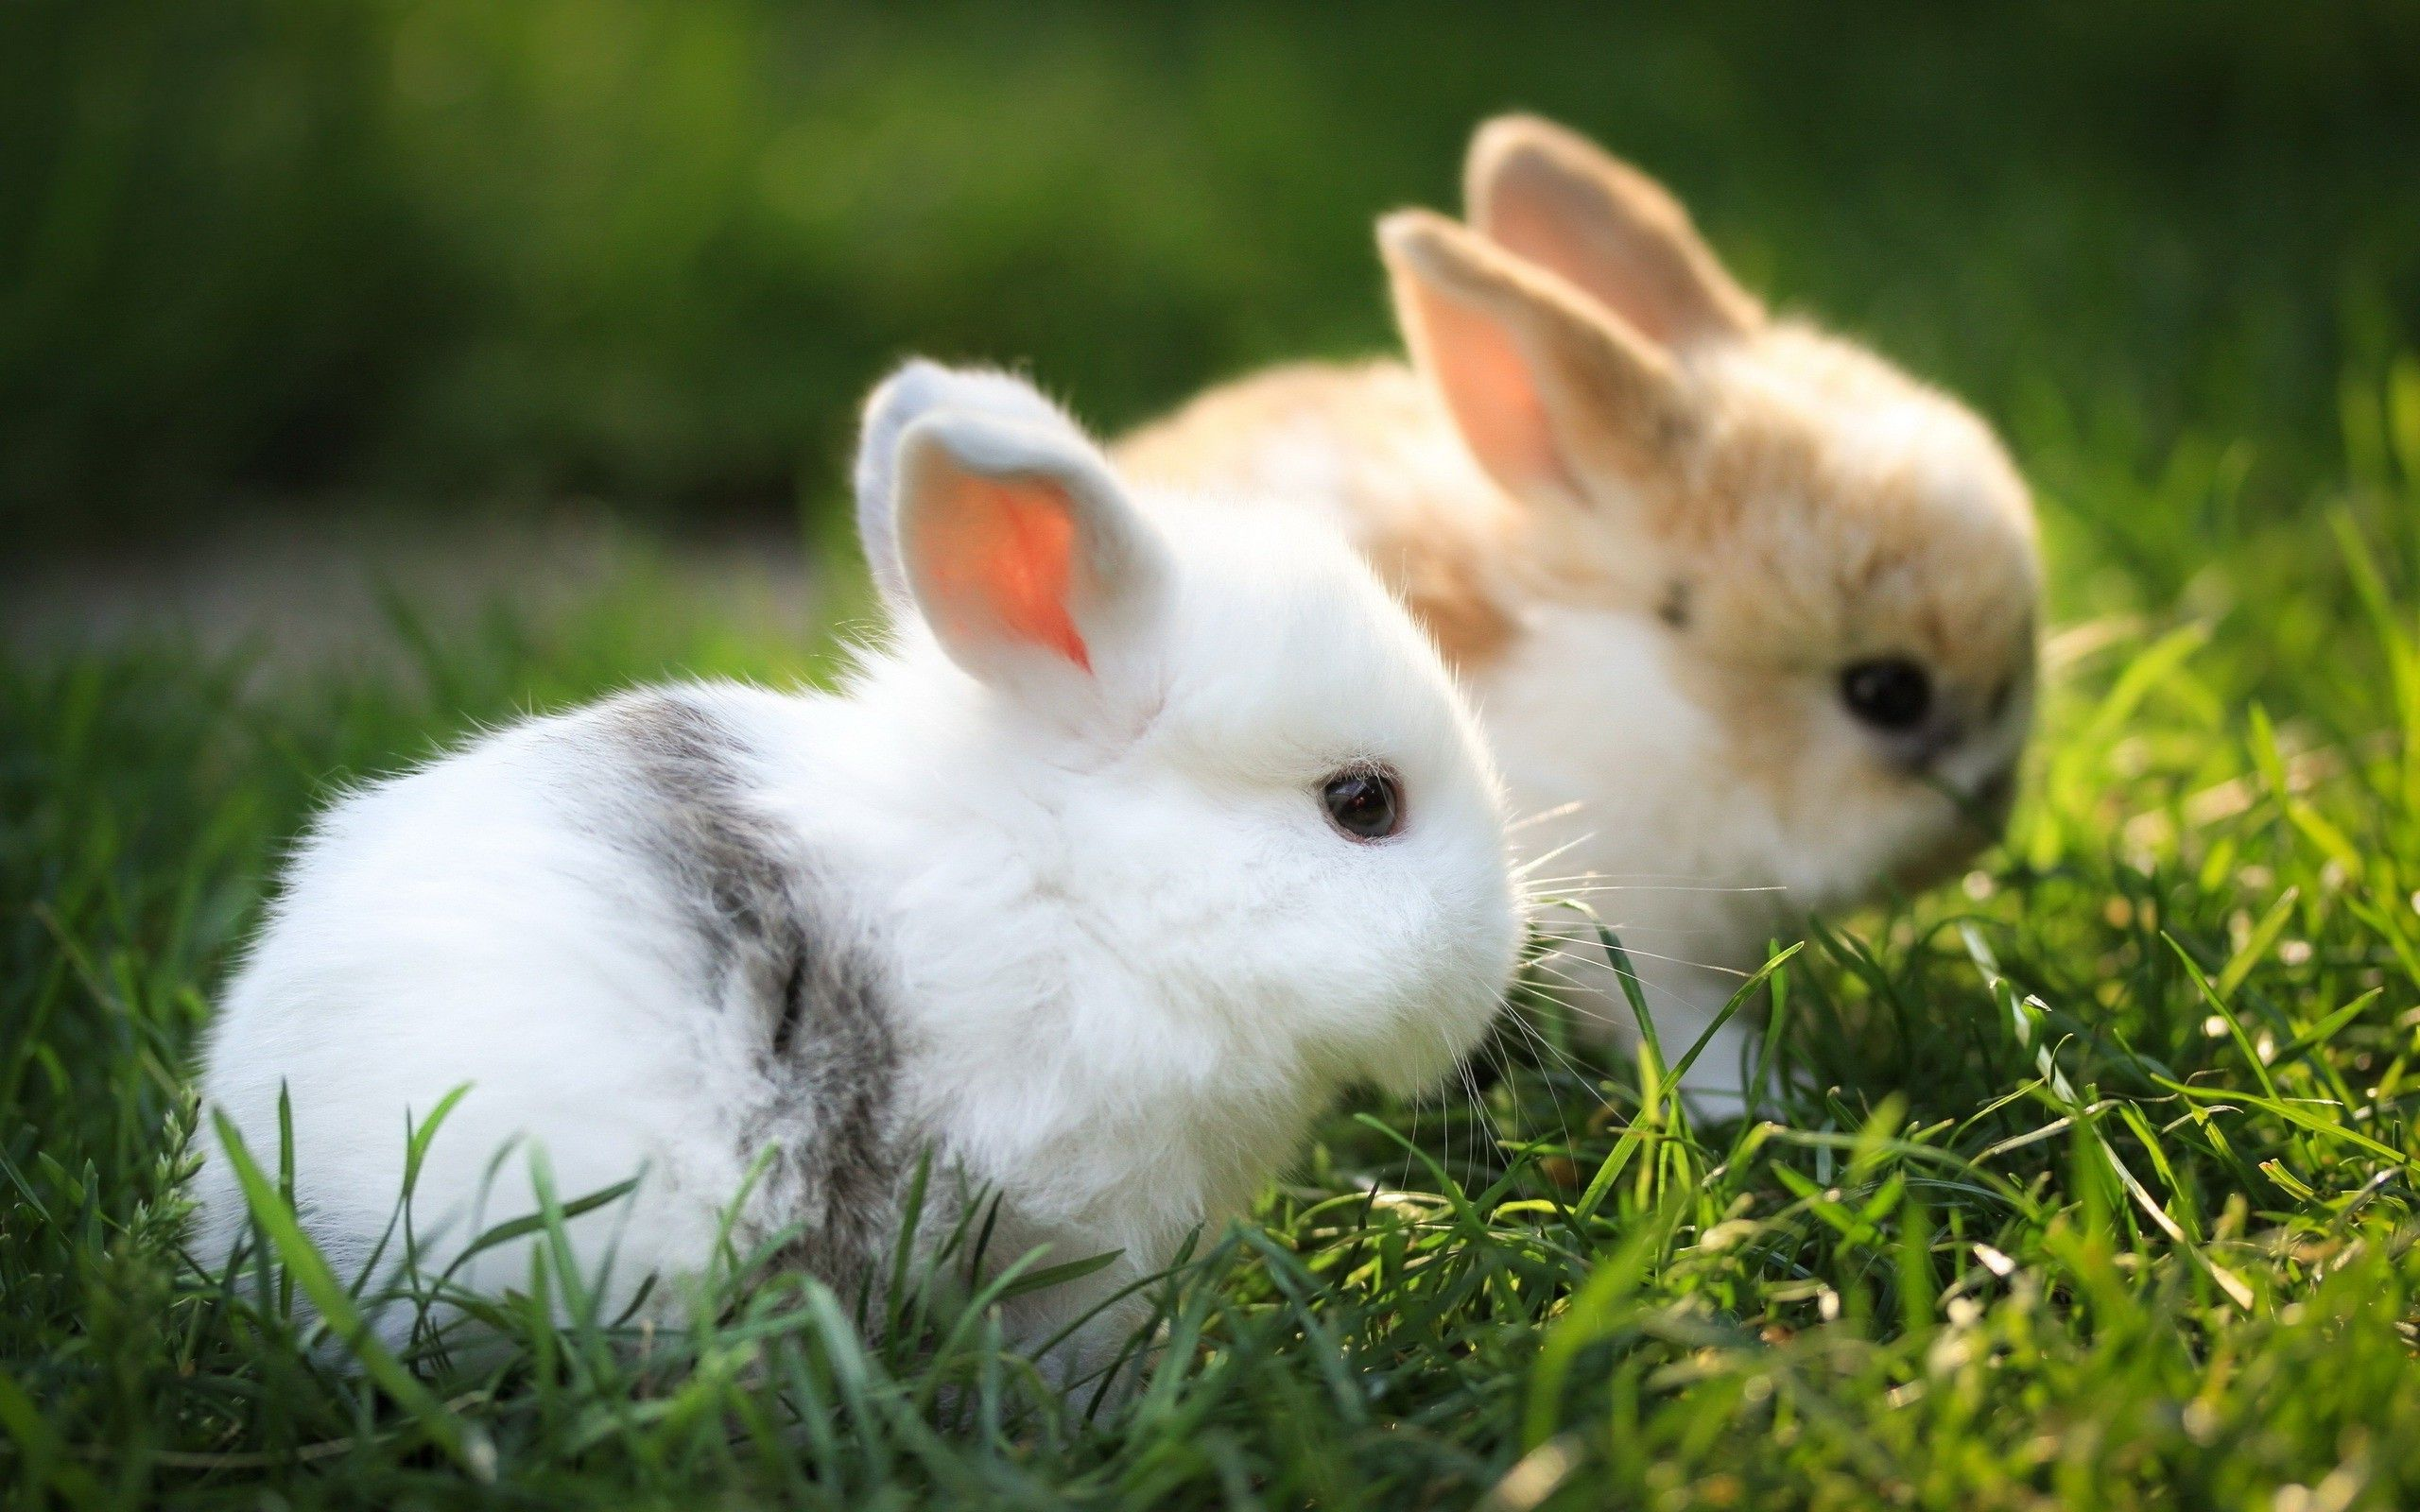 Baby Bunnies Wallpaper Free Desktop 8 Cute Bunny Gif Cute Baby Bunnies Baby Bunnies